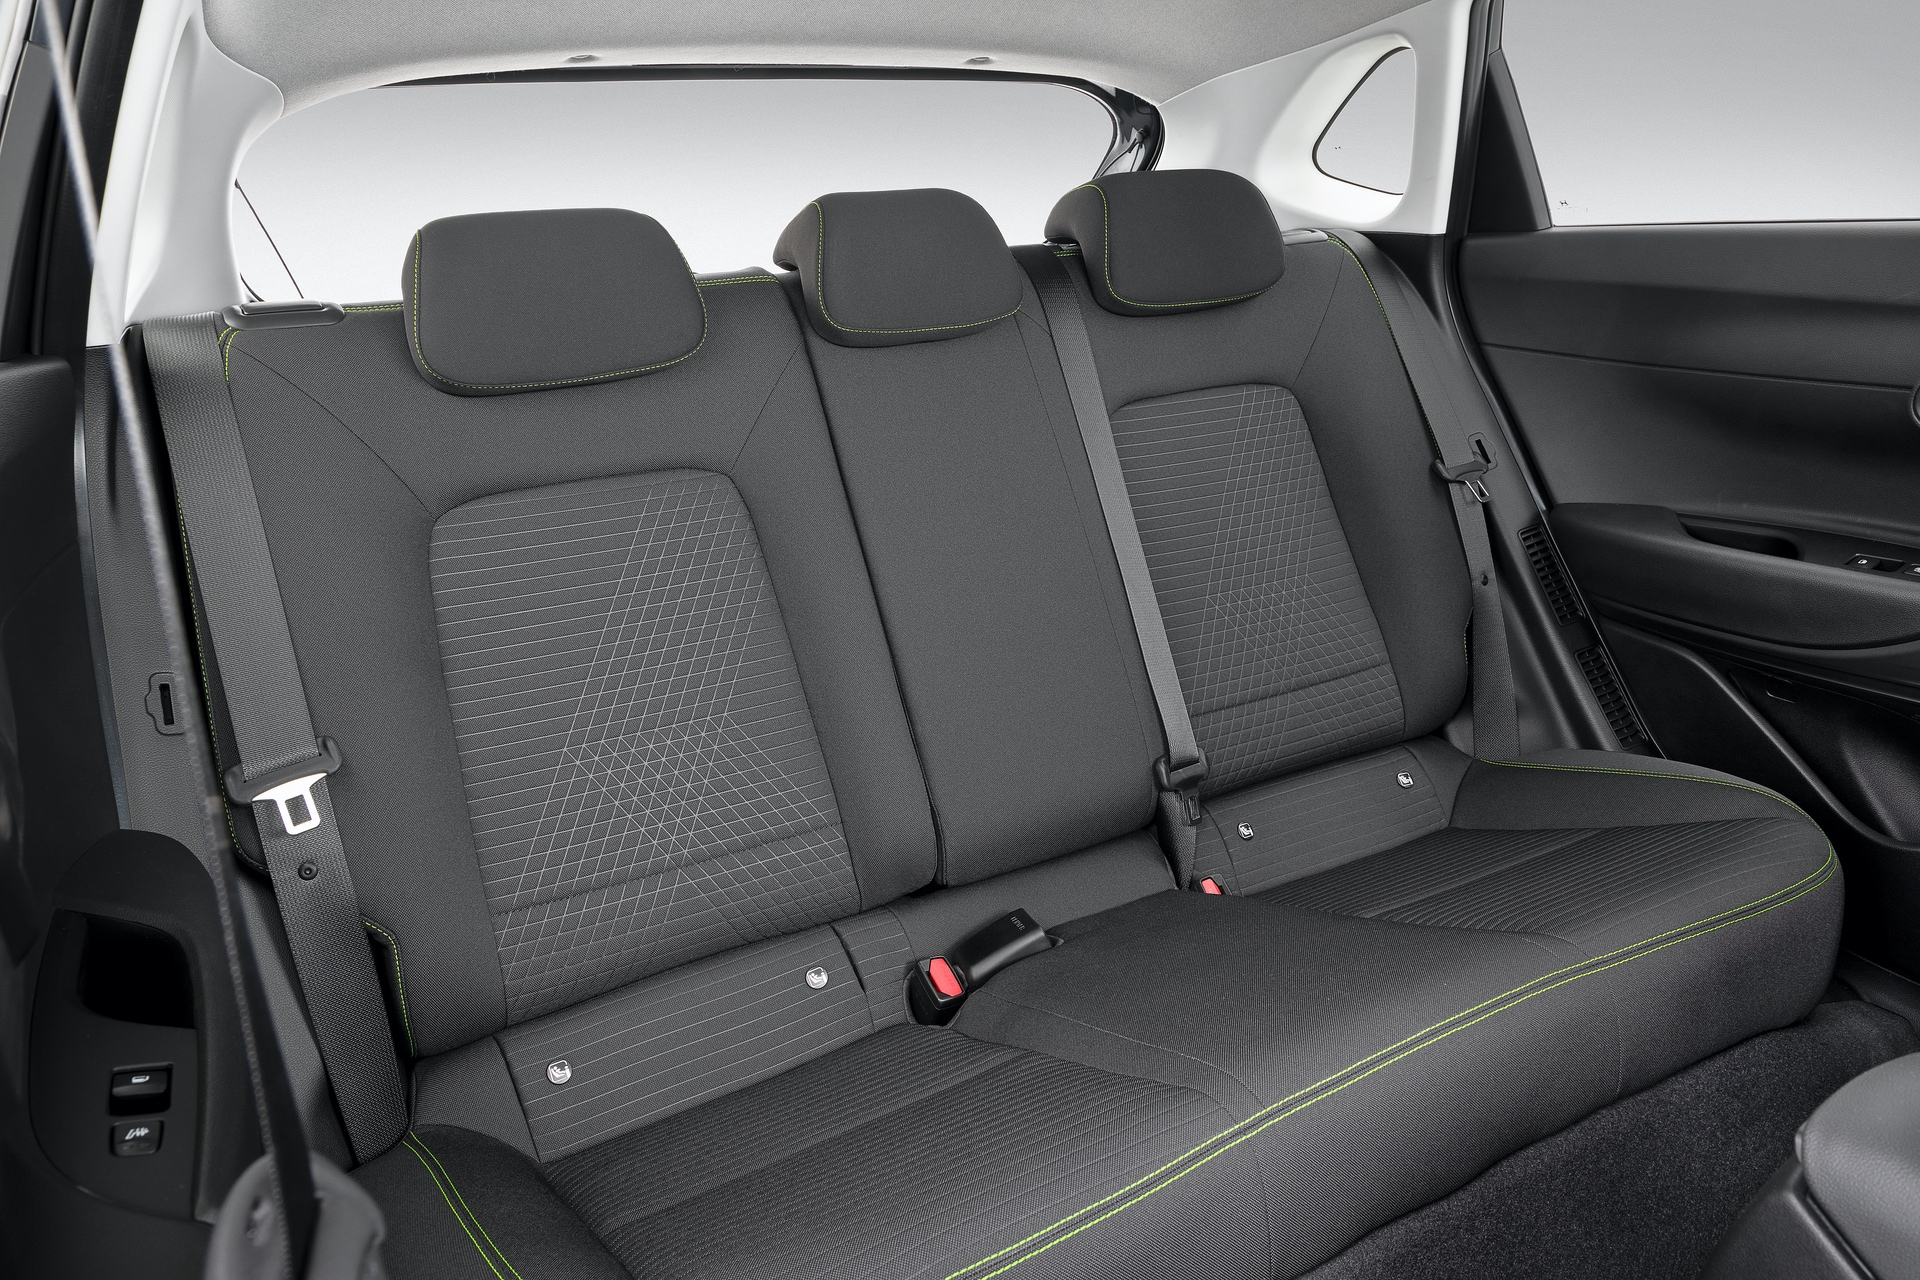 Hyundai_i20_interior_0006